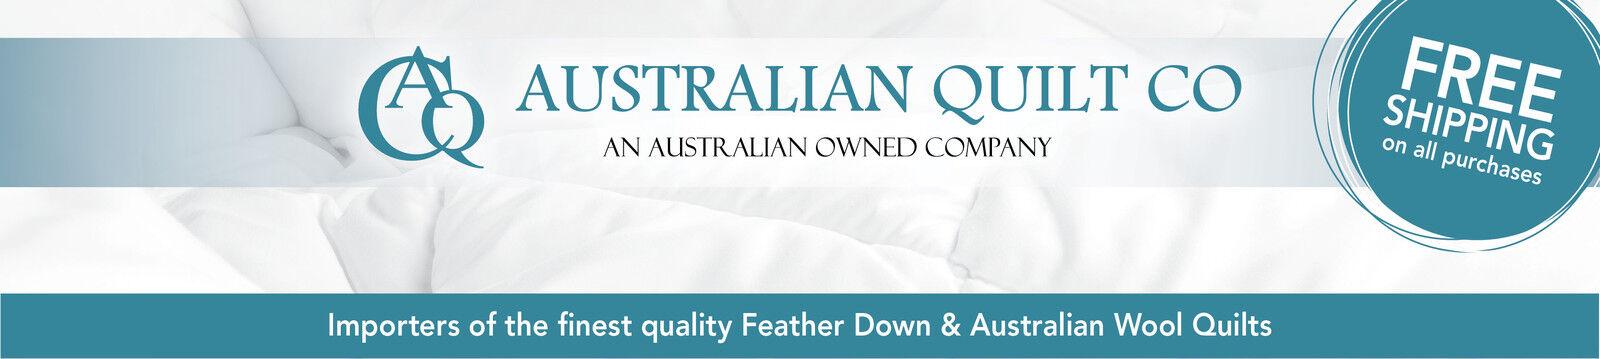 australianquiltco